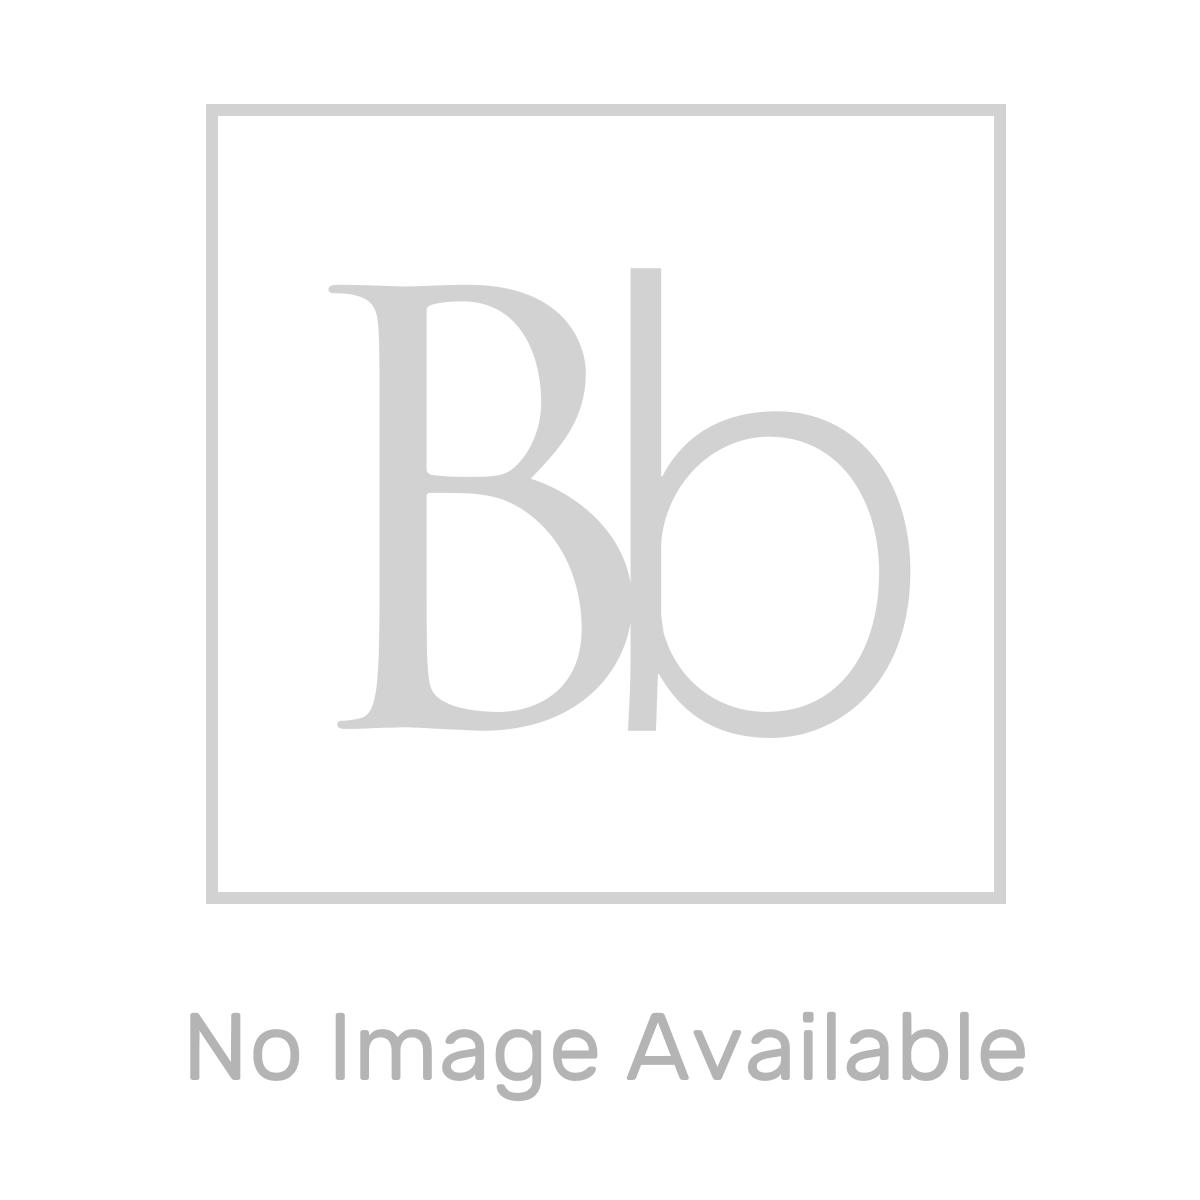 Aquadart Black Slate Shower Tray 1400 x 800 Lifestyle